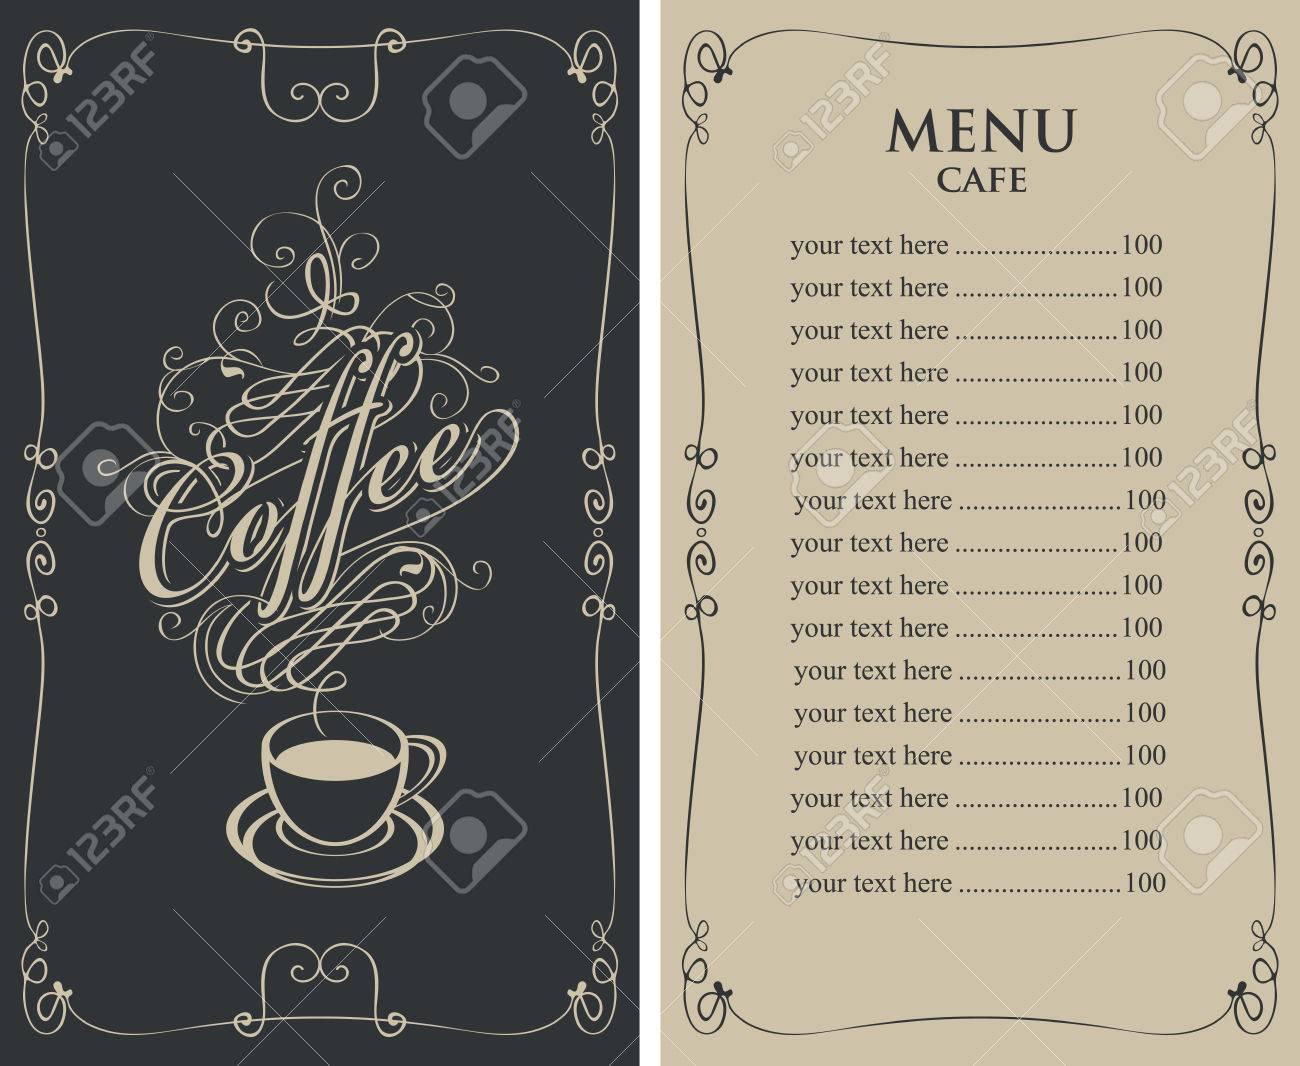 Charmant Cafe Menü Vorlagen Frei Bilder - Entry Level Resume ...